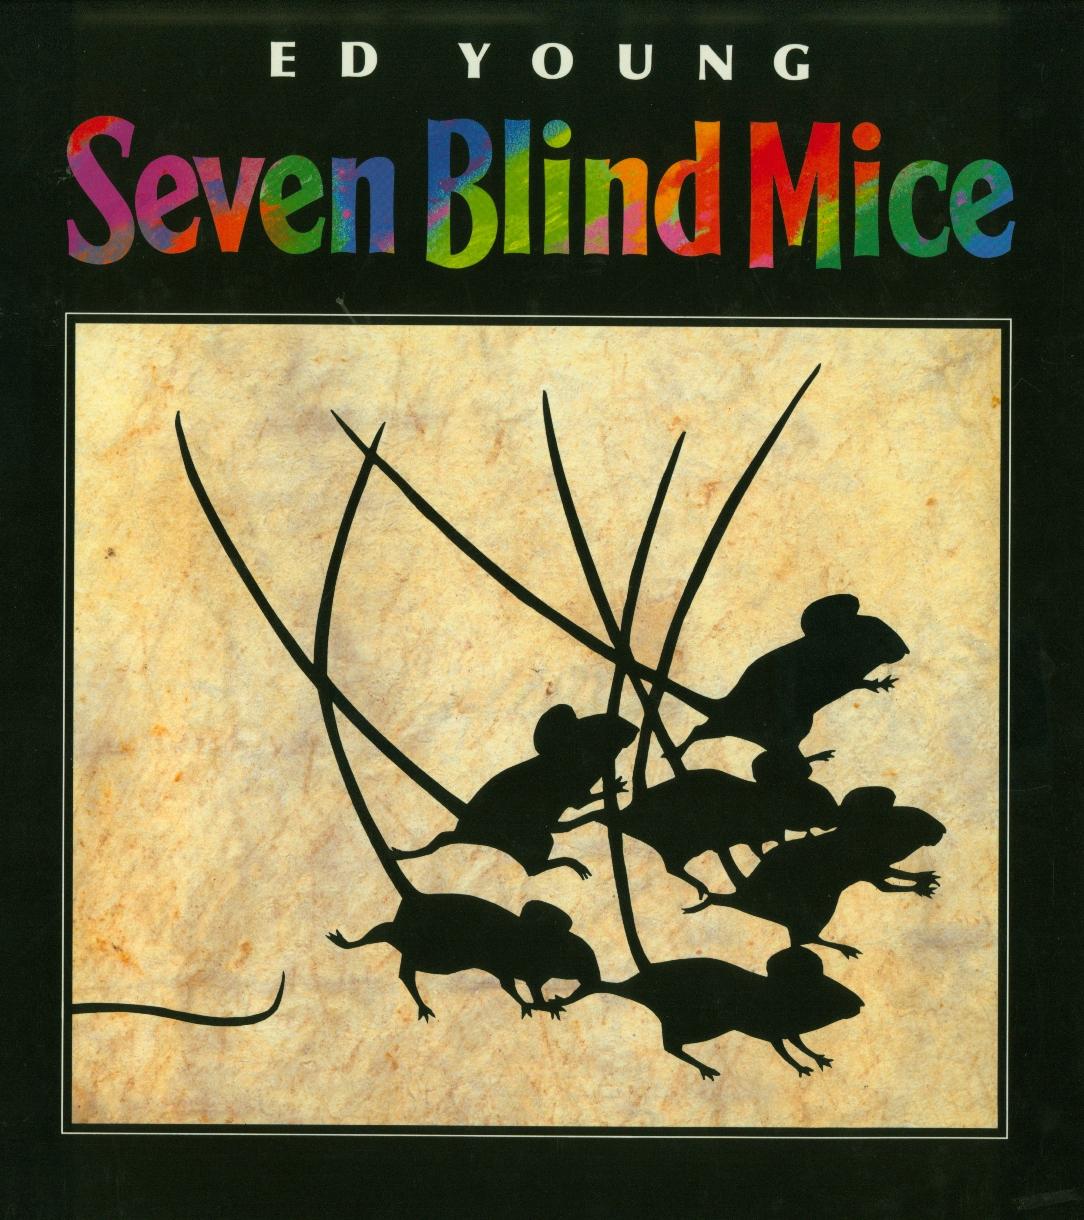 Seven Blind Mice, jacket